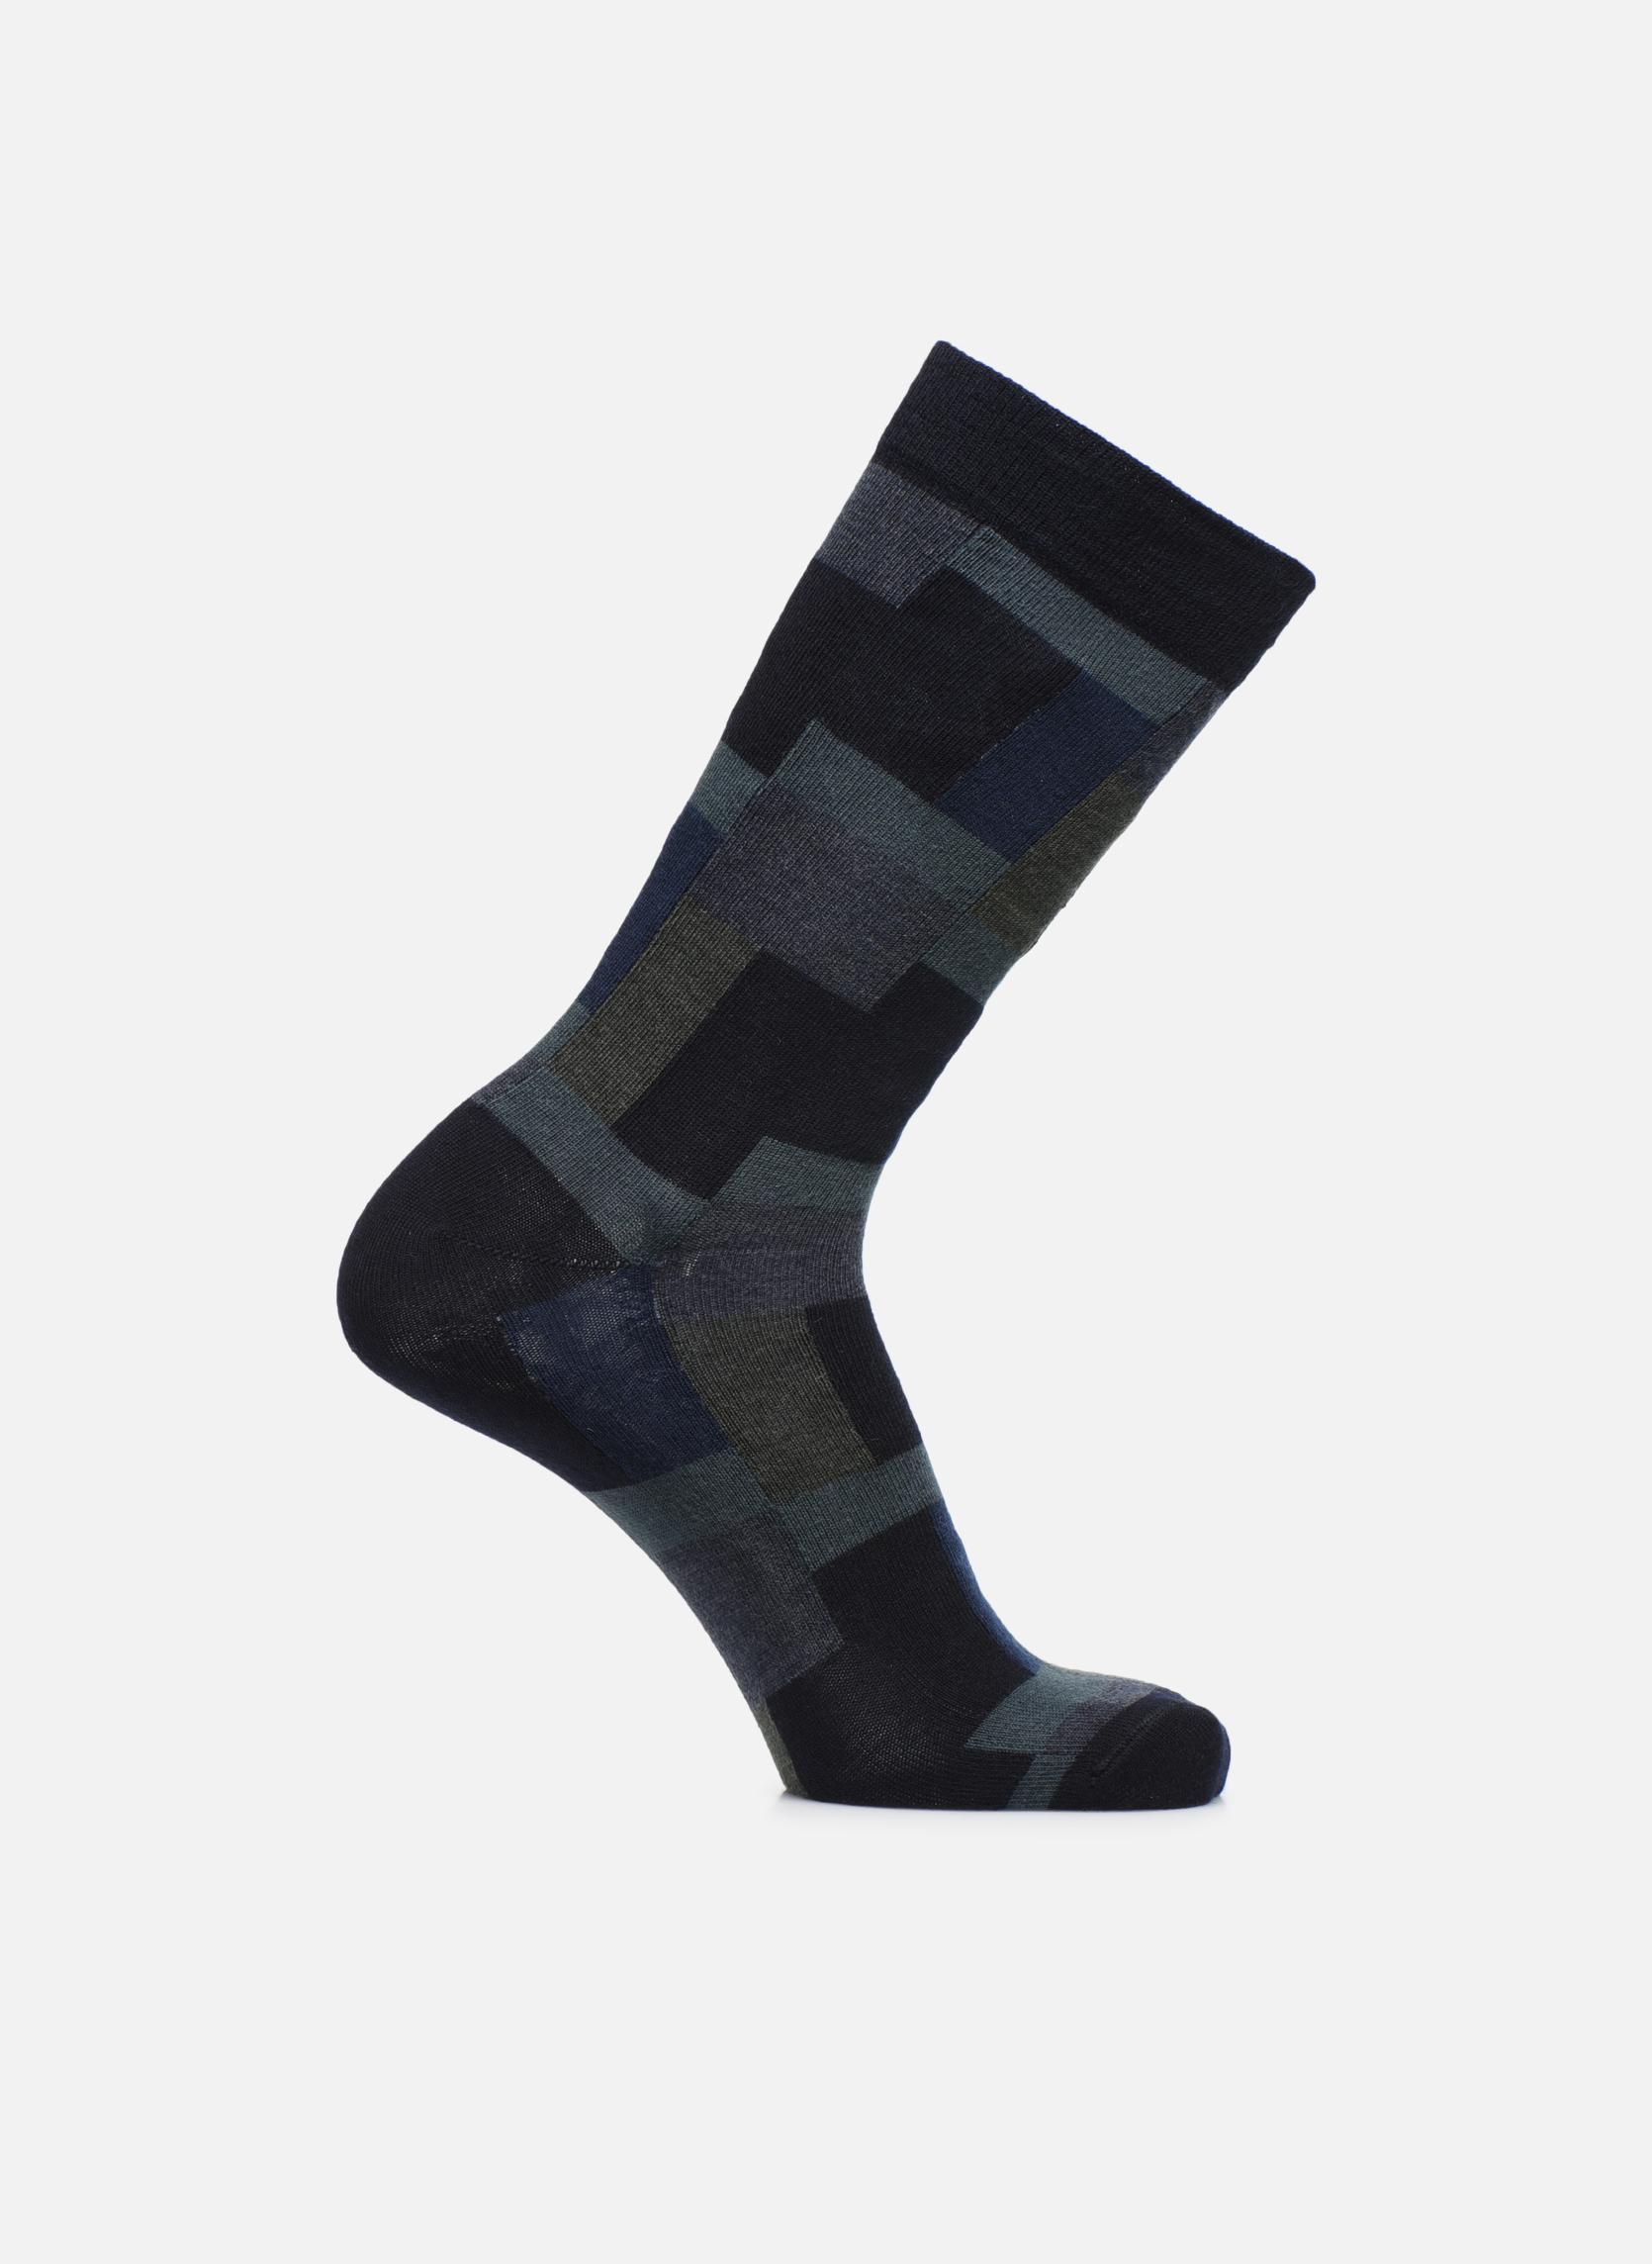 Socks GÉOMÉTRIE 044 - bleu